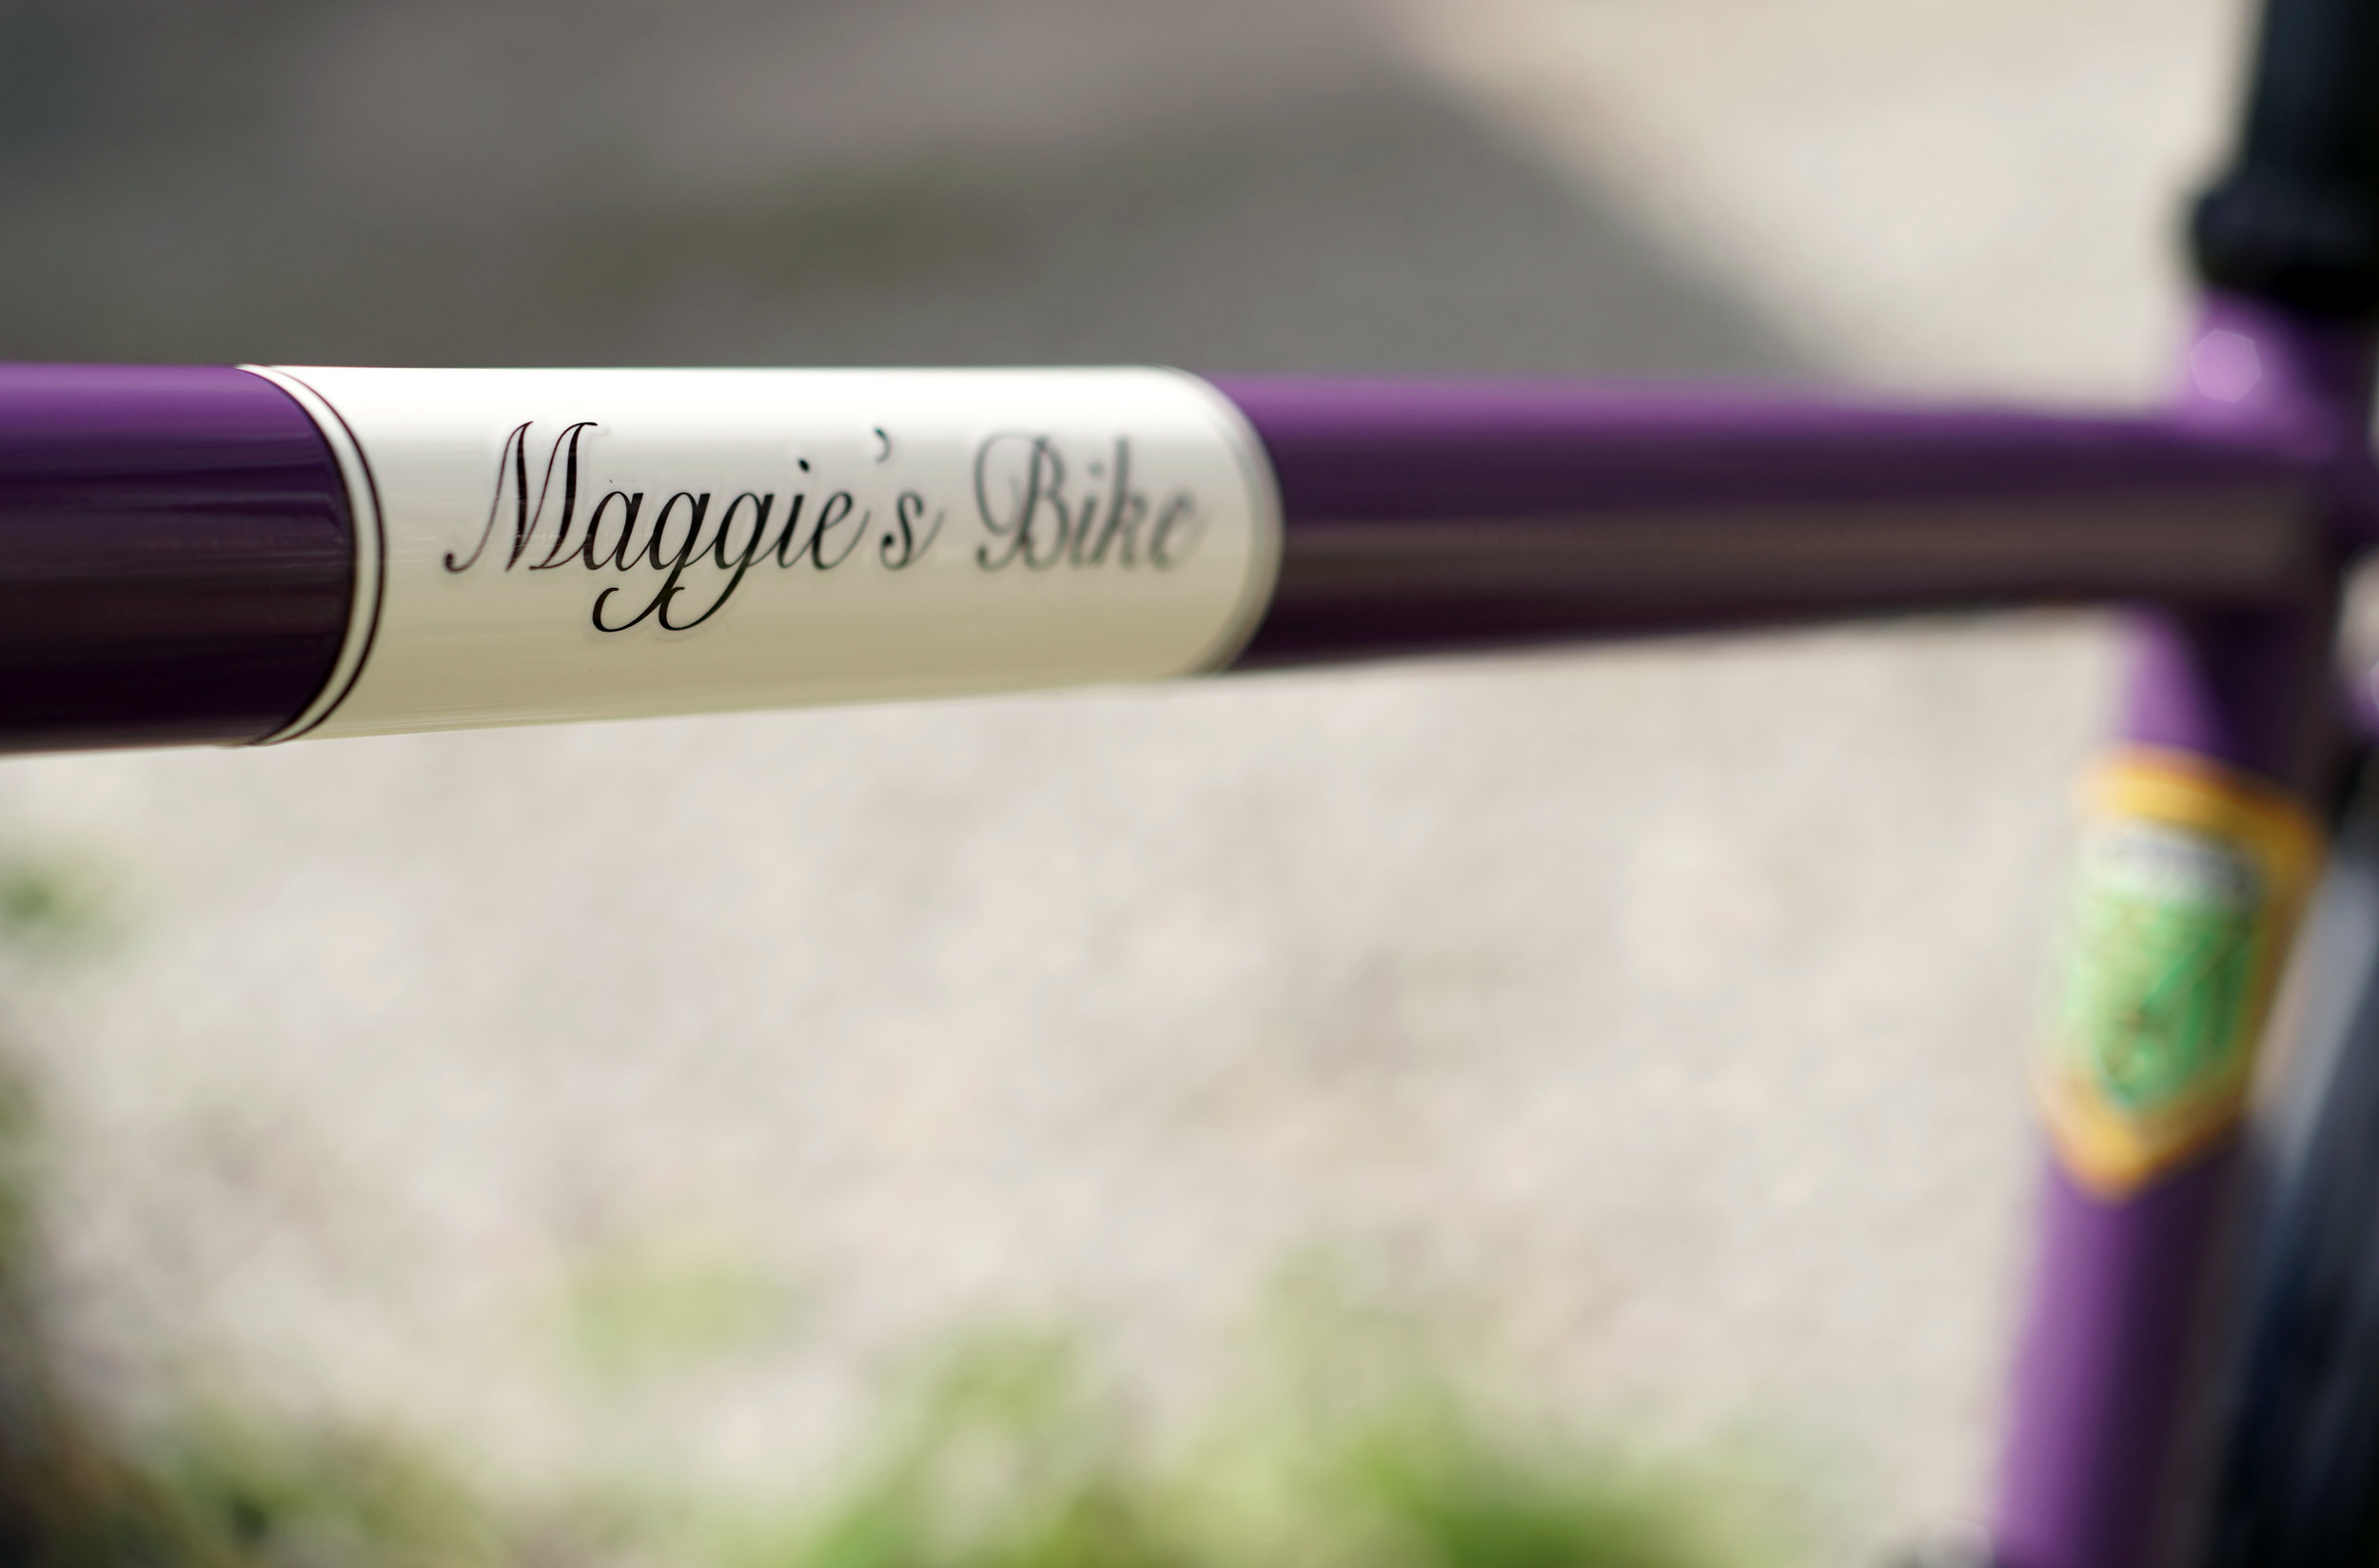 Maggiesbike.jpg